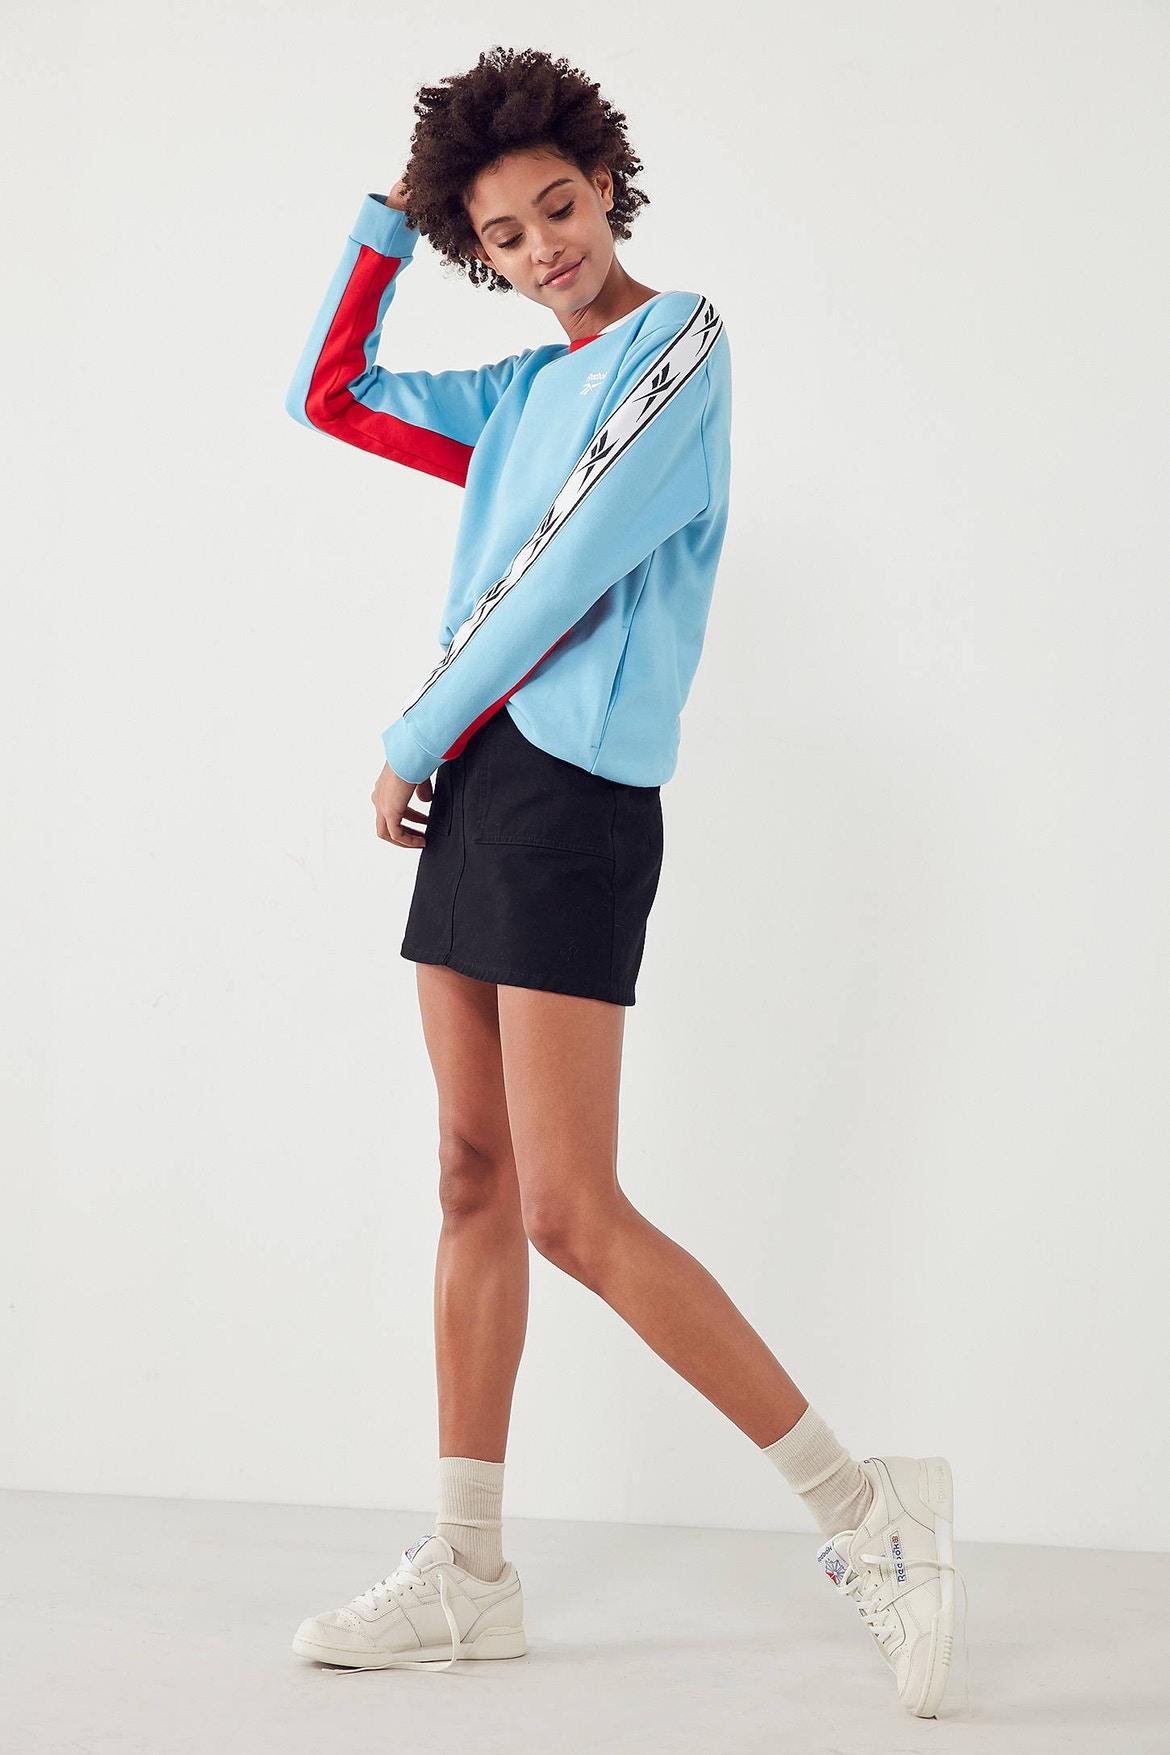 http-bae.hypebeast.comfiles201707reebok-urban-outfitters-vector-sweatshirt-blue-3